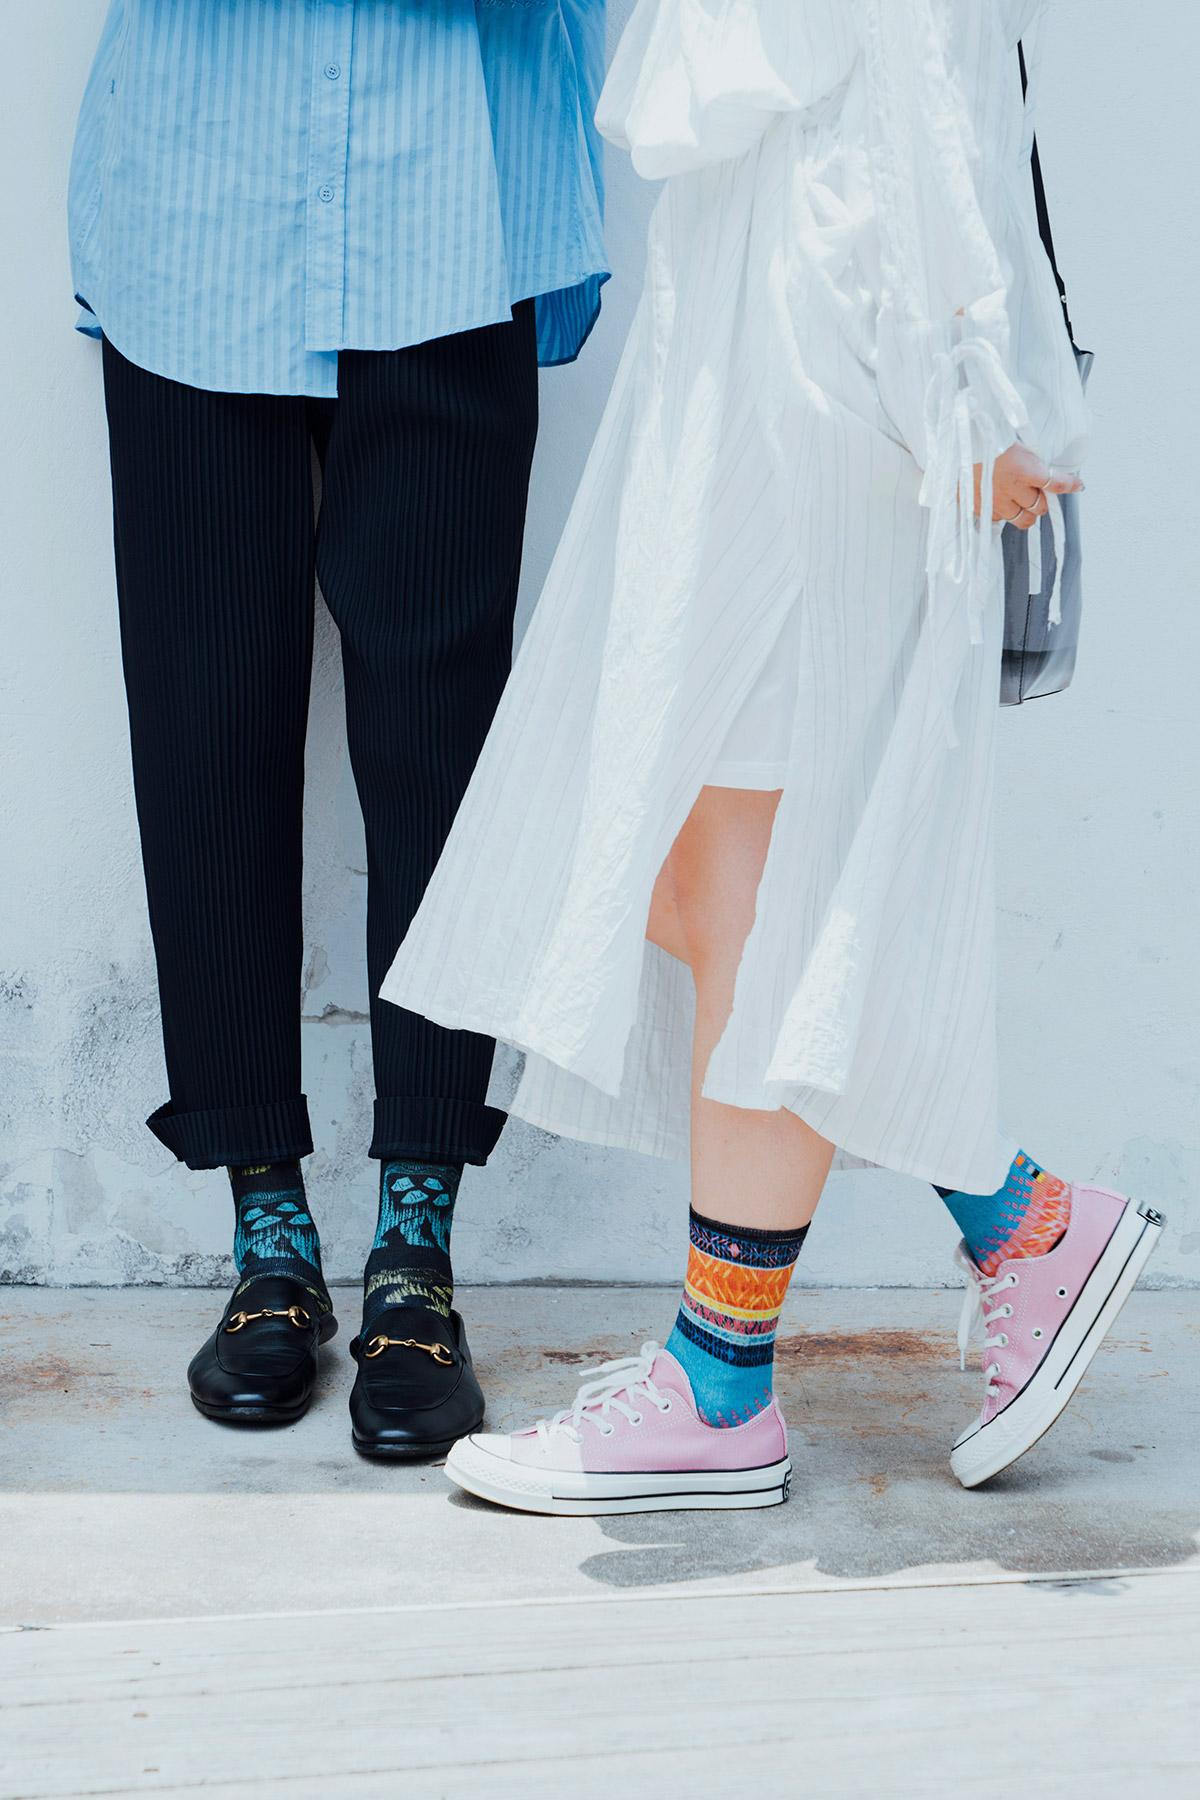 smartwool-couple-kim-10